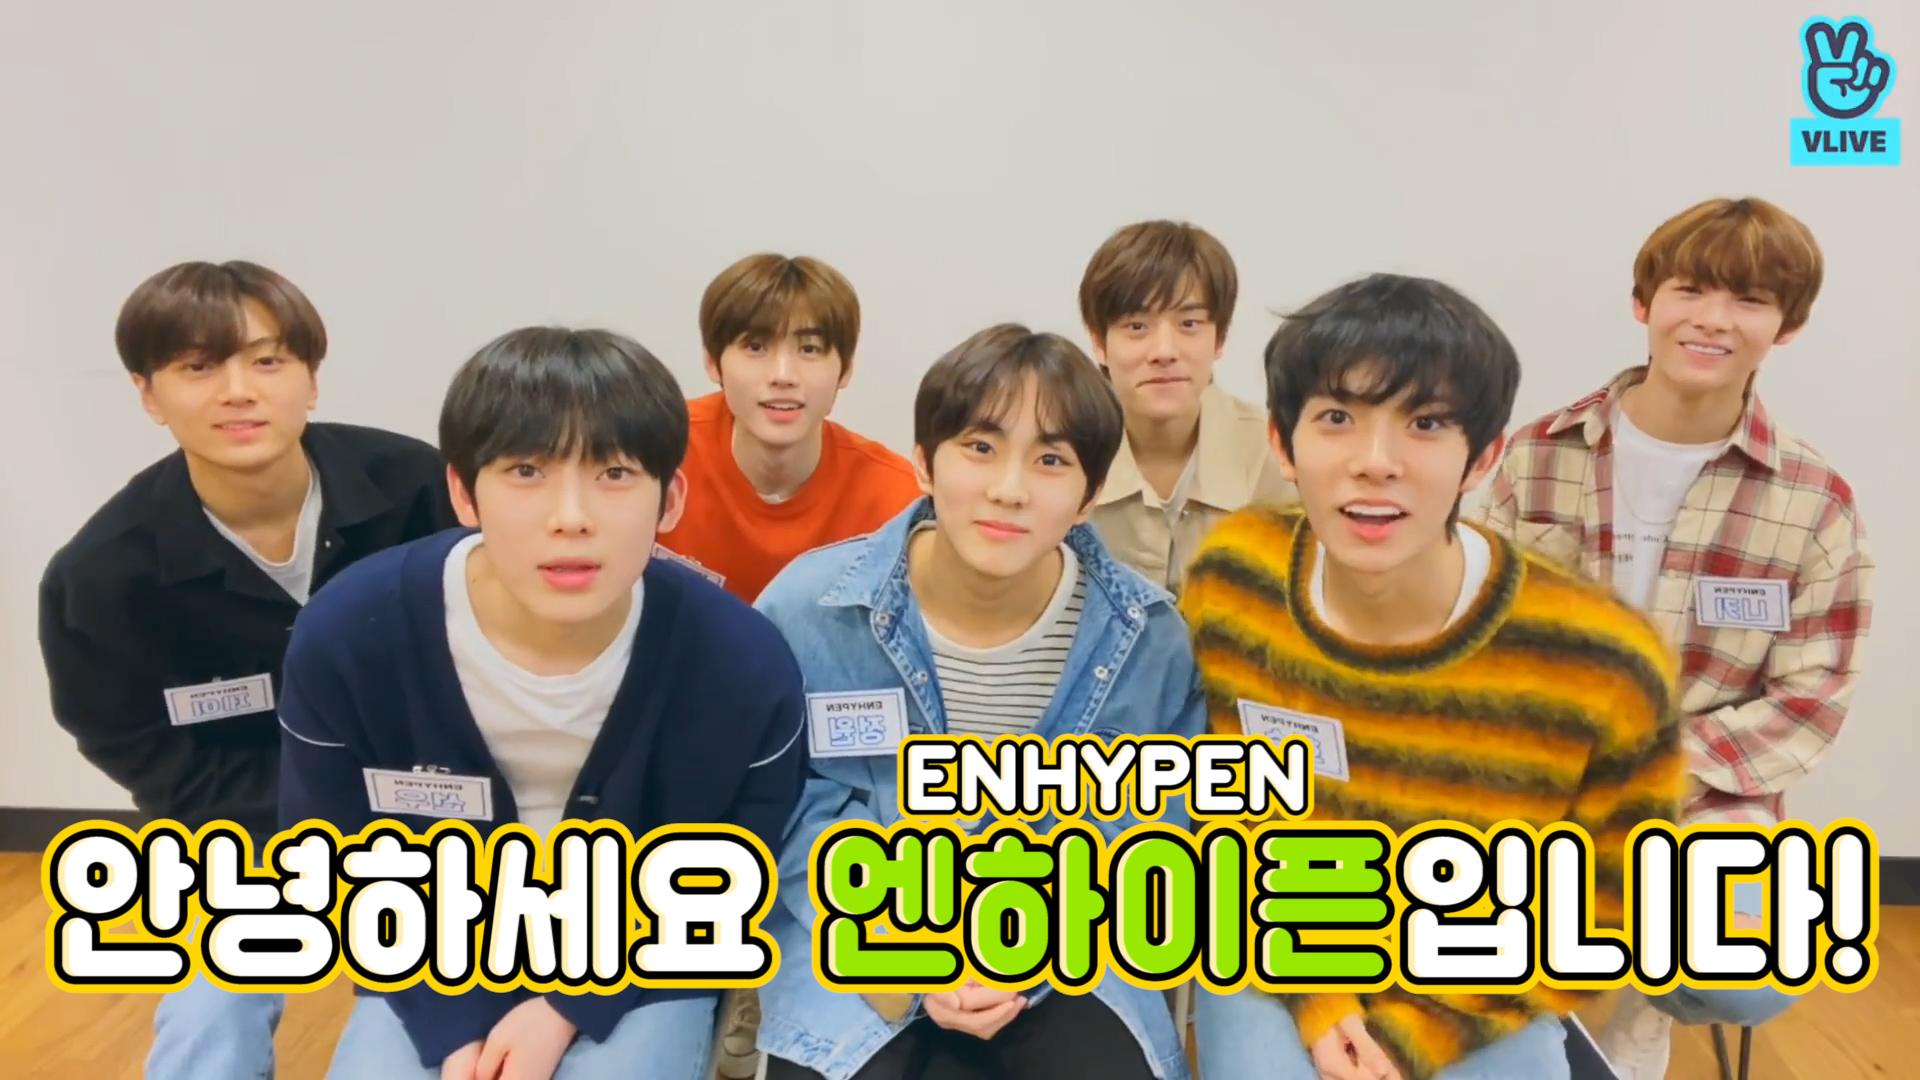 [ENHYPEN] 괜찮아! 엔하이픈이 귀여워서 호흡이 멈췄을 뿐이야! (ENHYPEN's first V!)